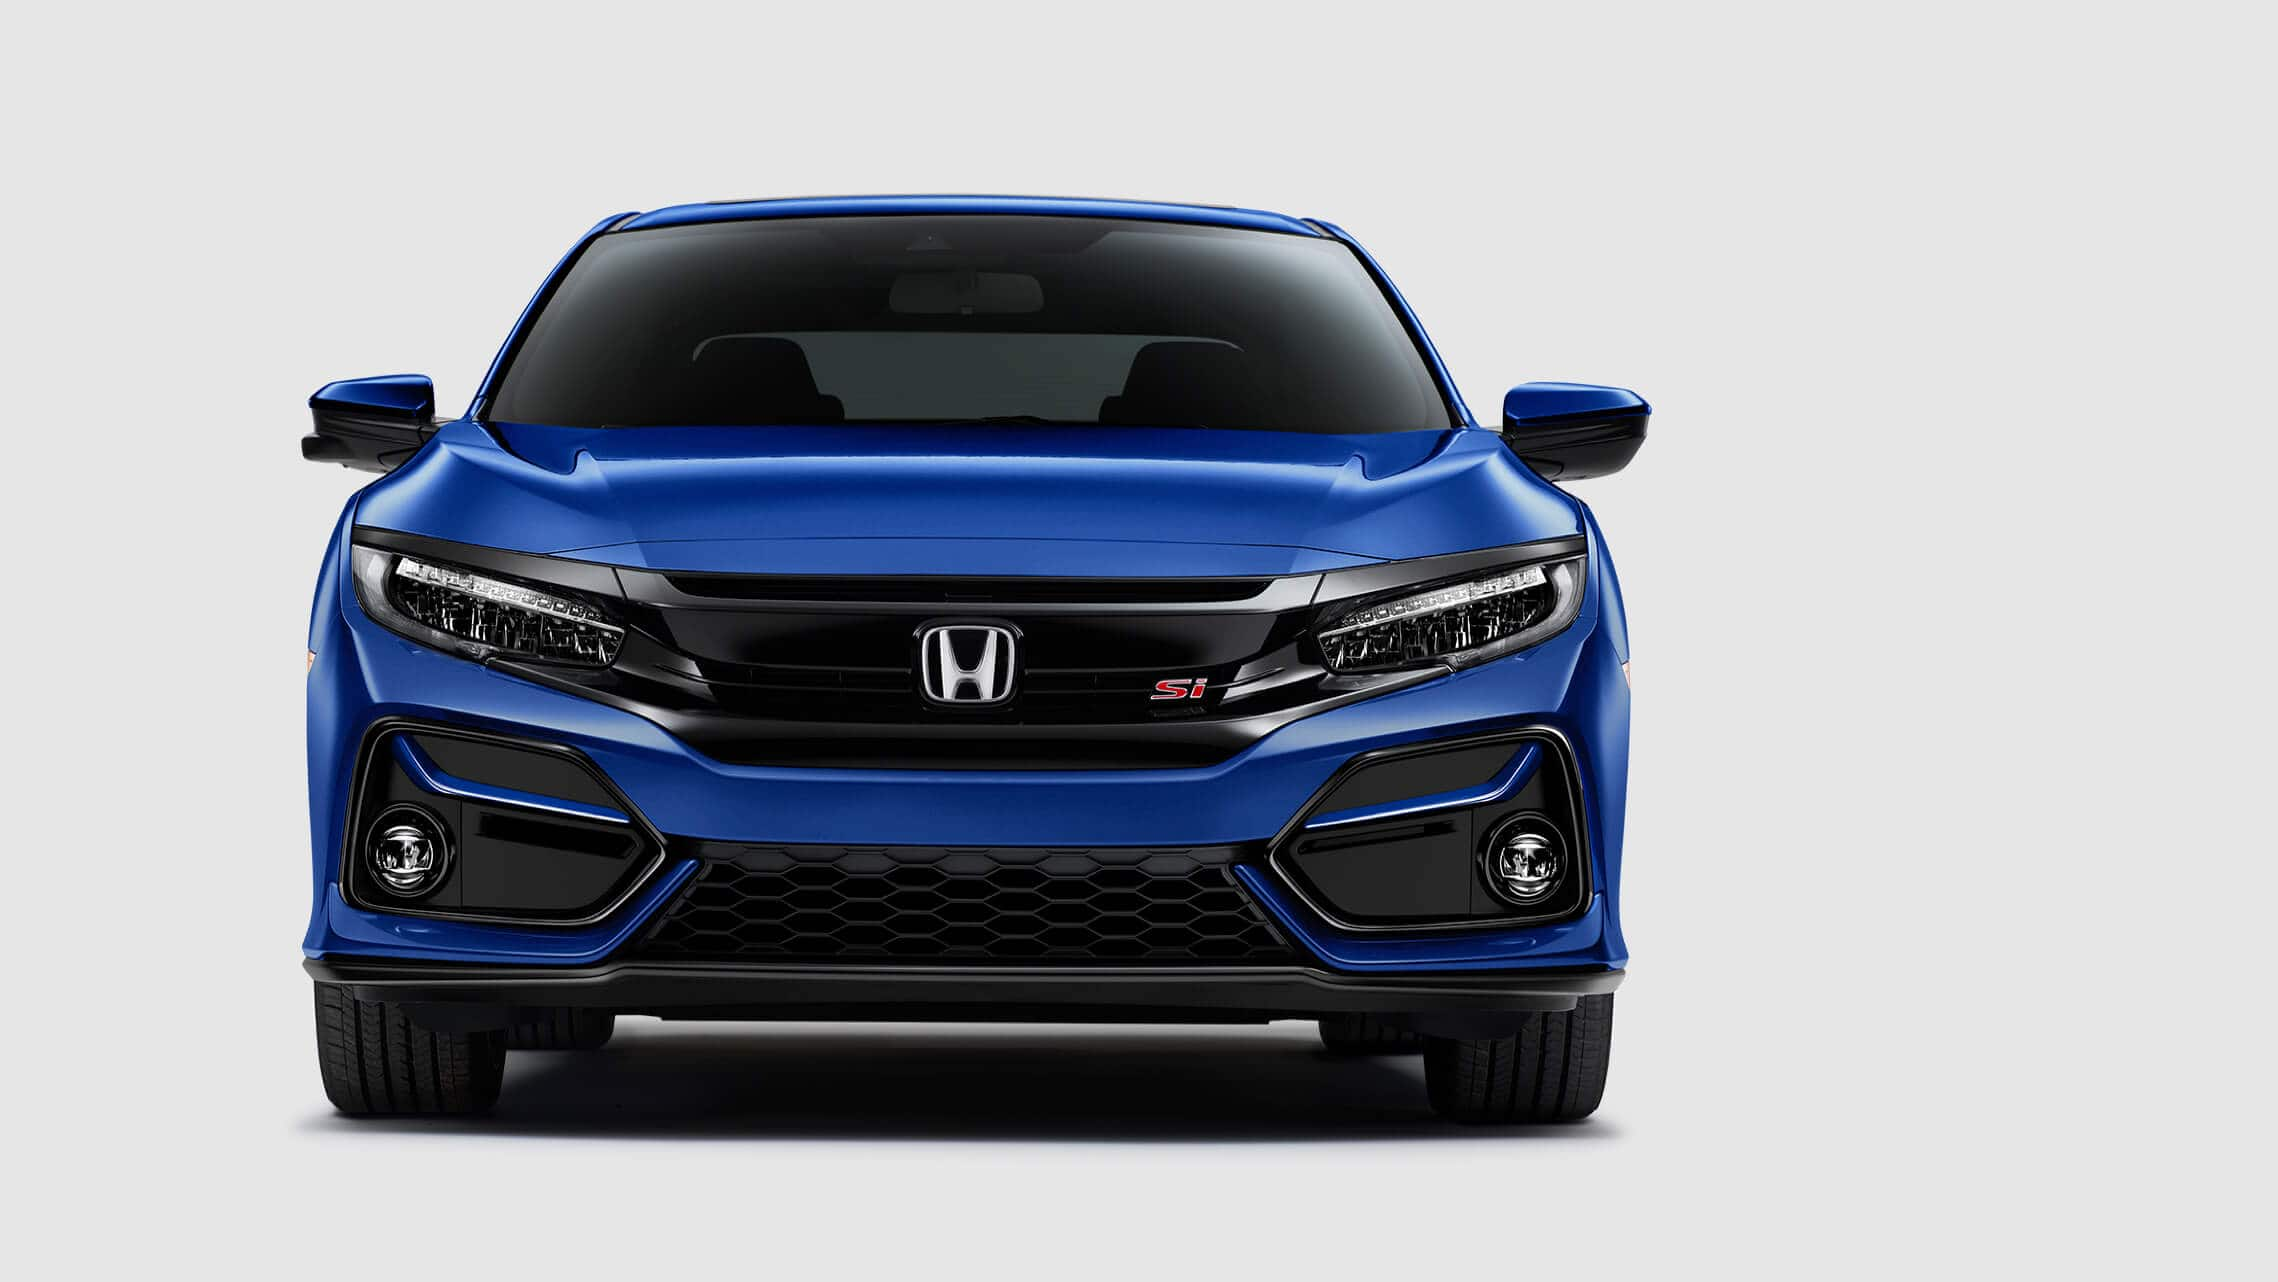 Vista frontal del Honda Civic Si Sedán2020 en Aegean Blue Metallic.